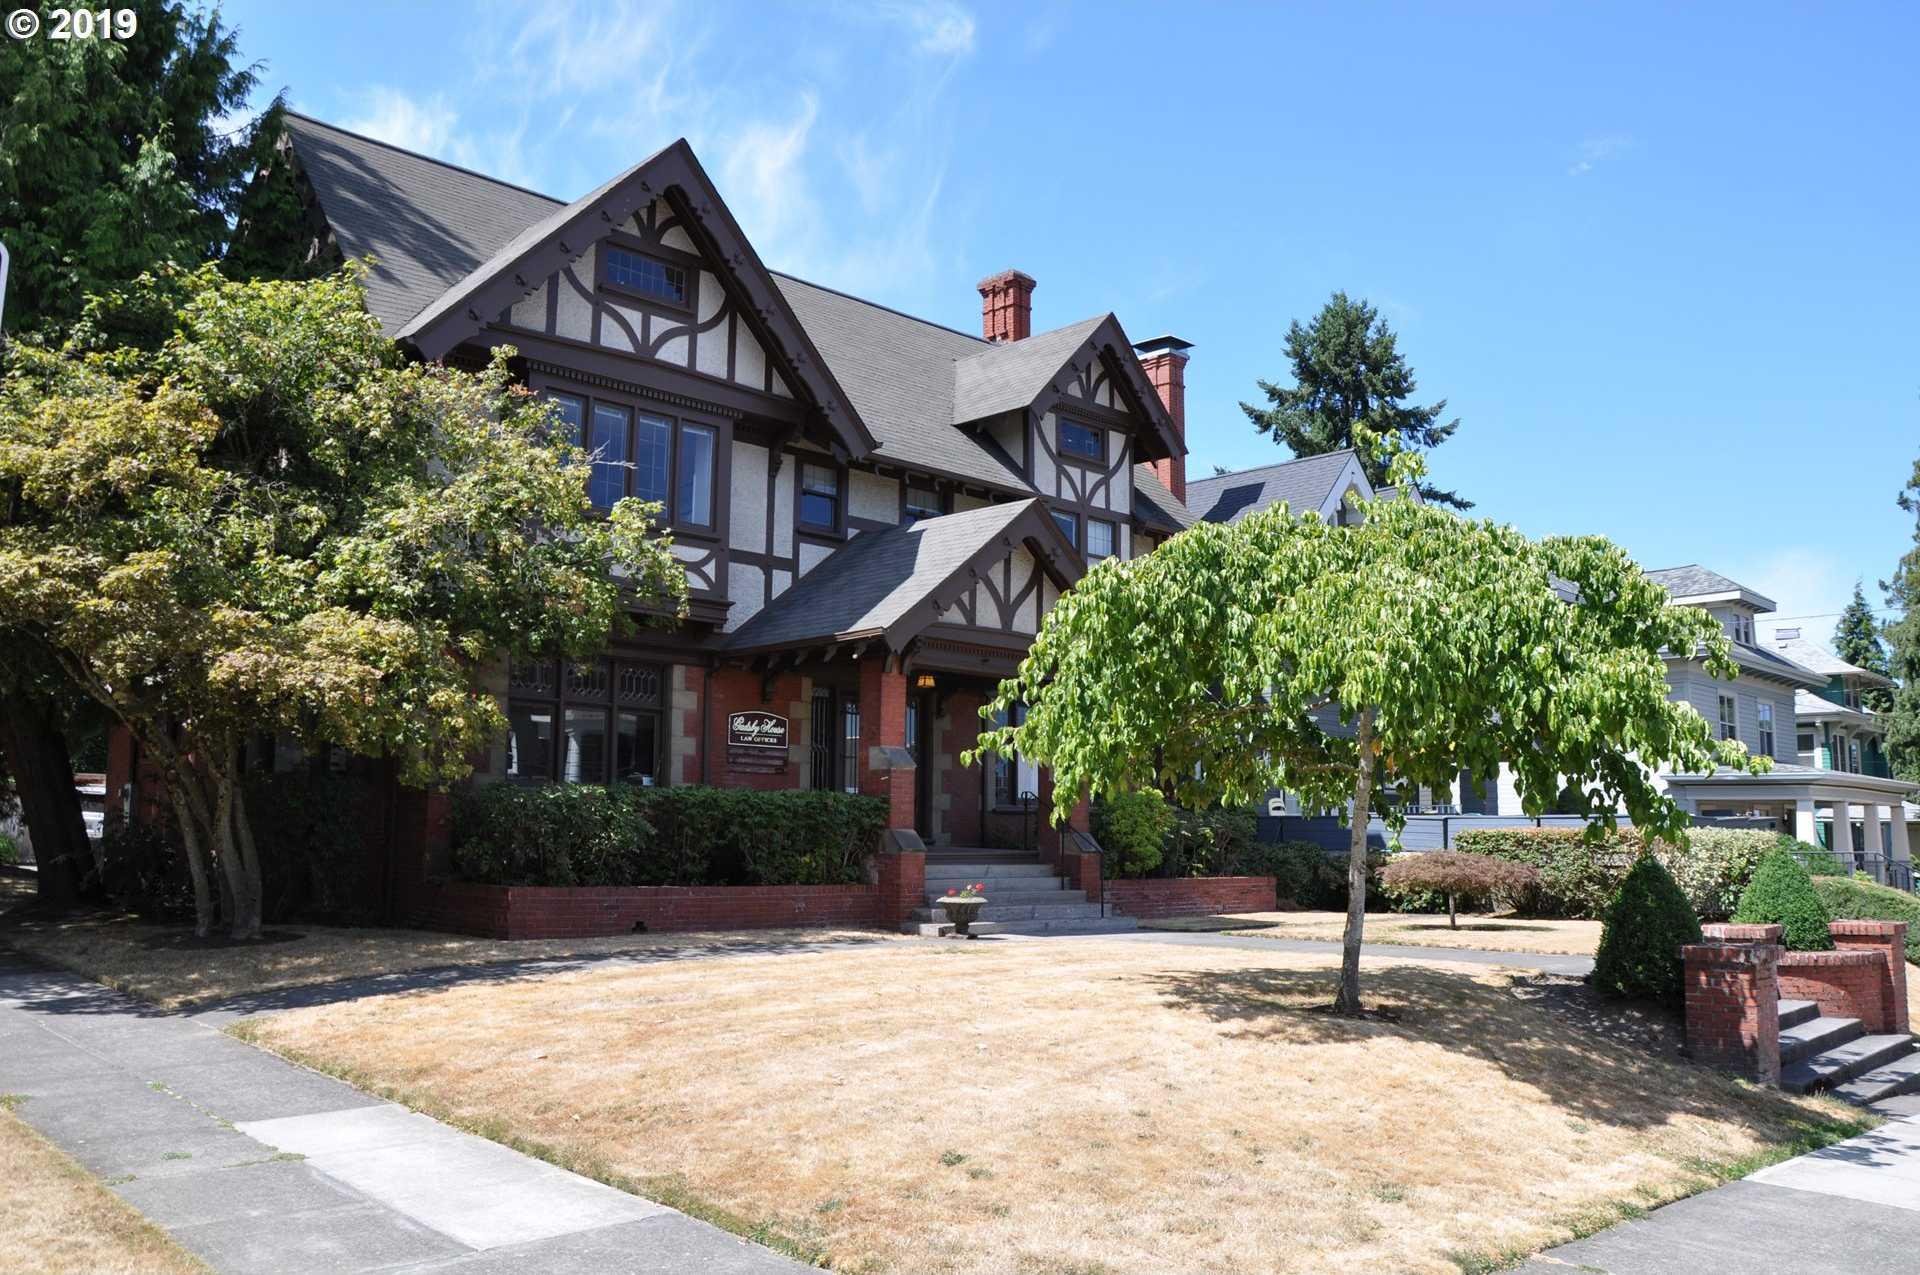 $1,950,000 - 5Br/2Ba -  for Sale in Northwest Portland, Portland